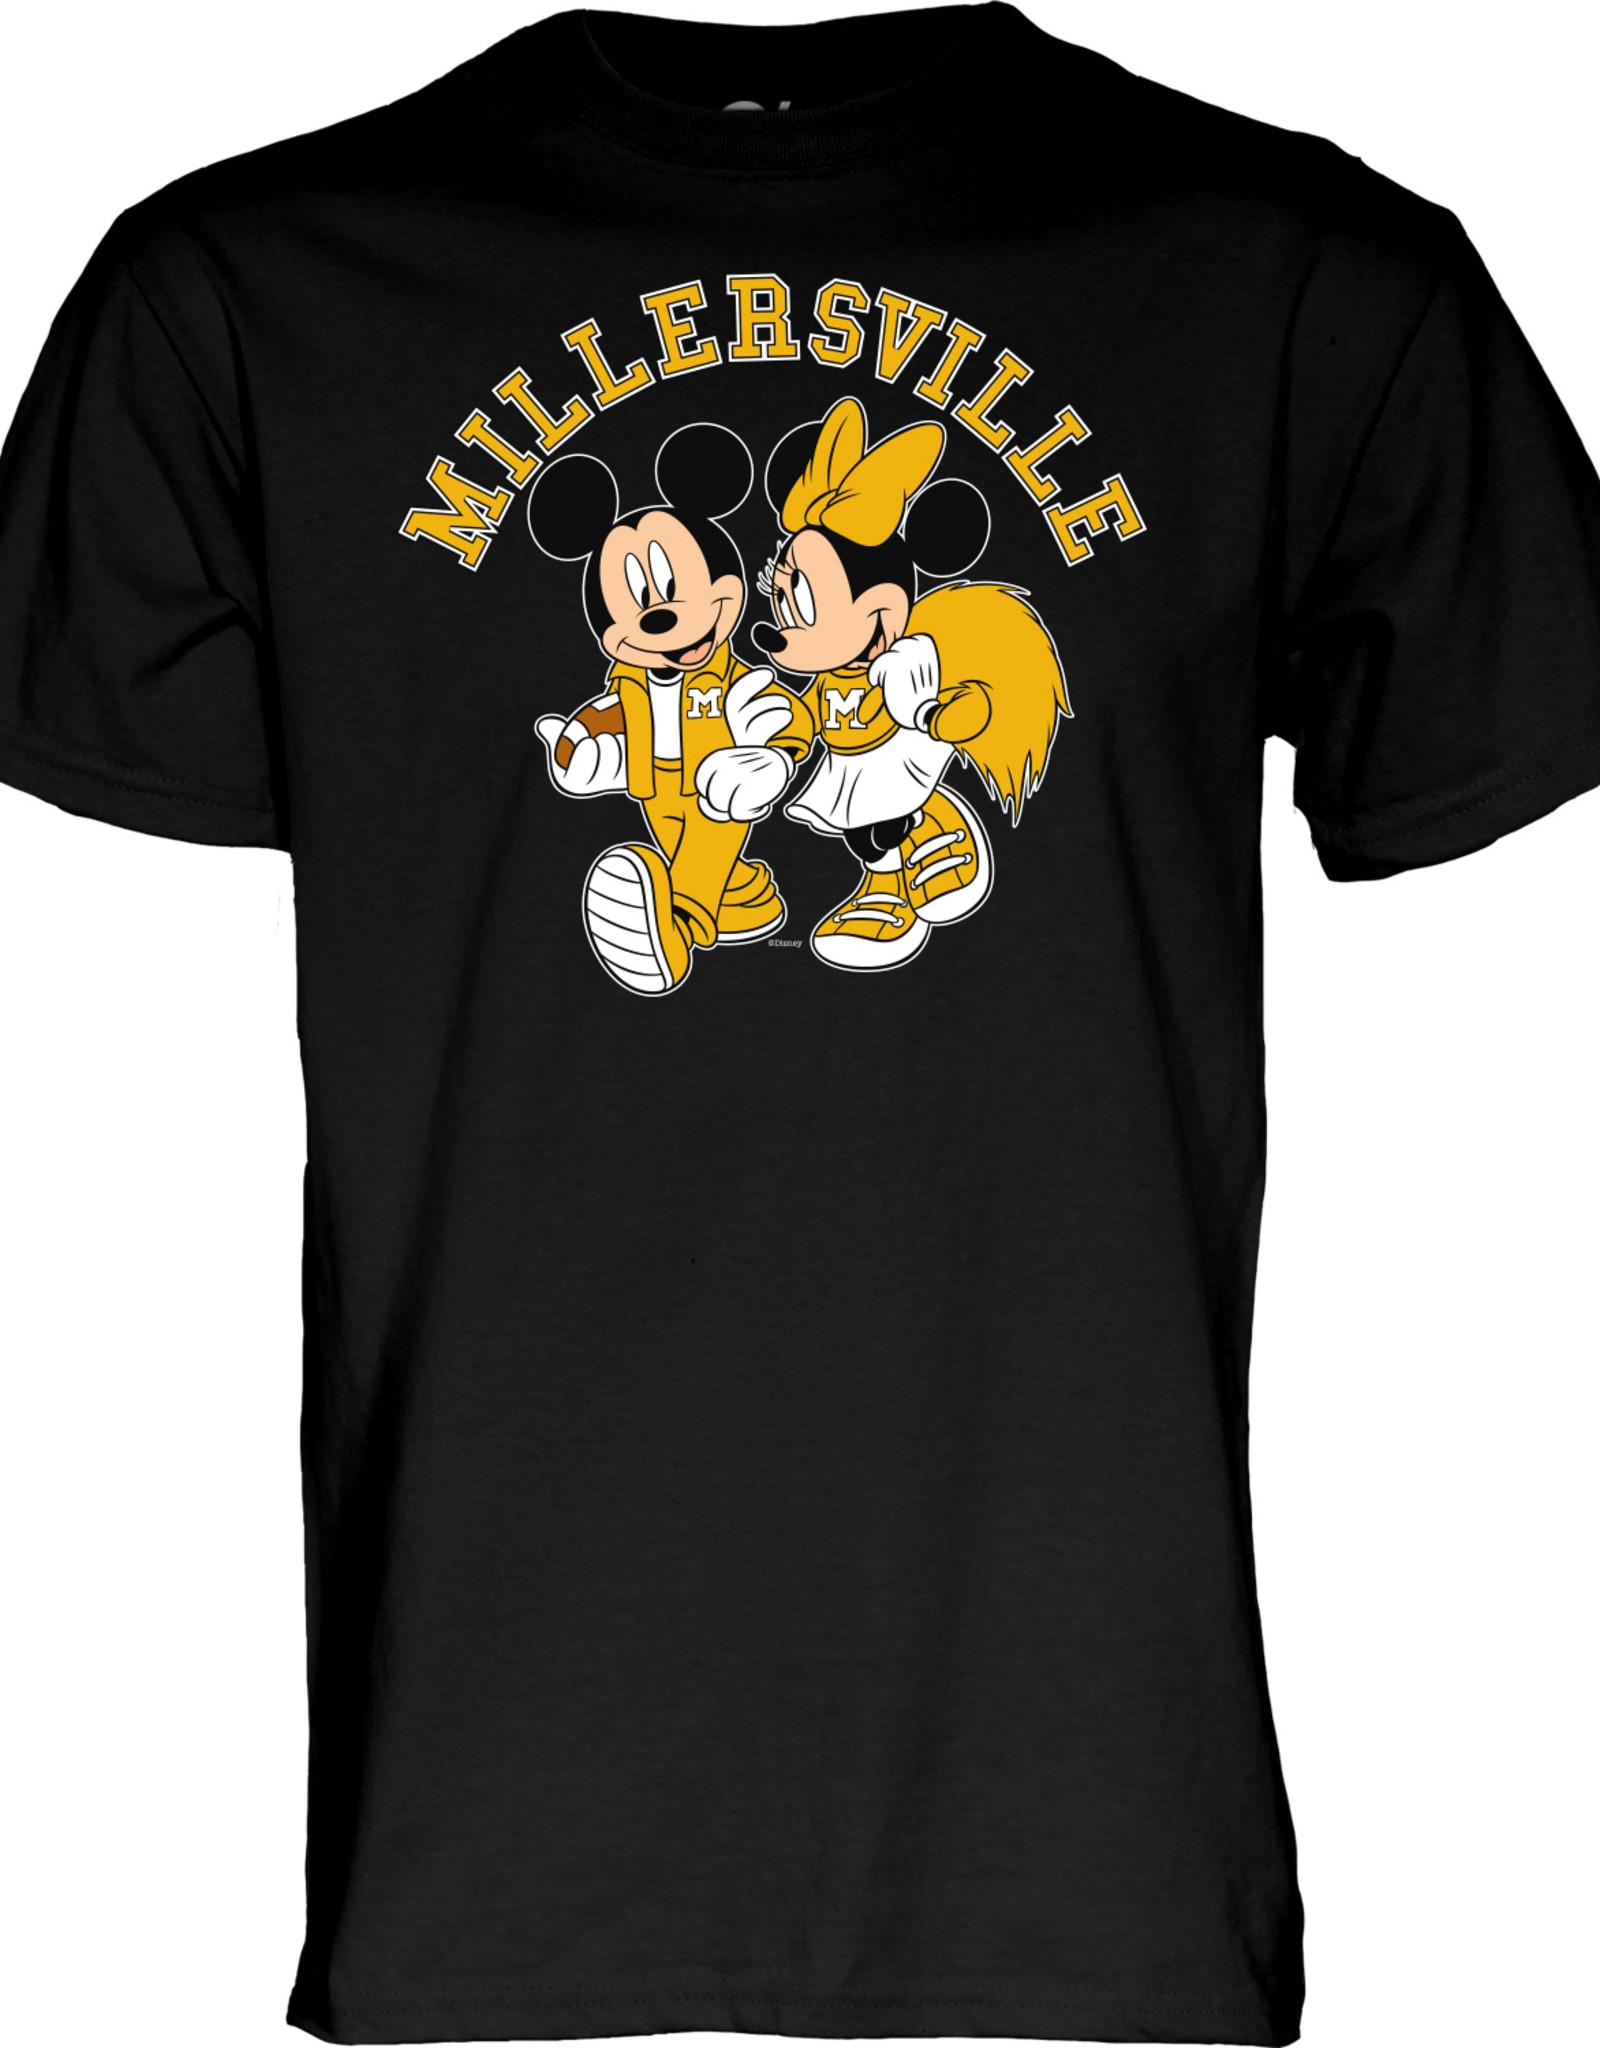 Disney Mickey and Minnie Cheer Tee